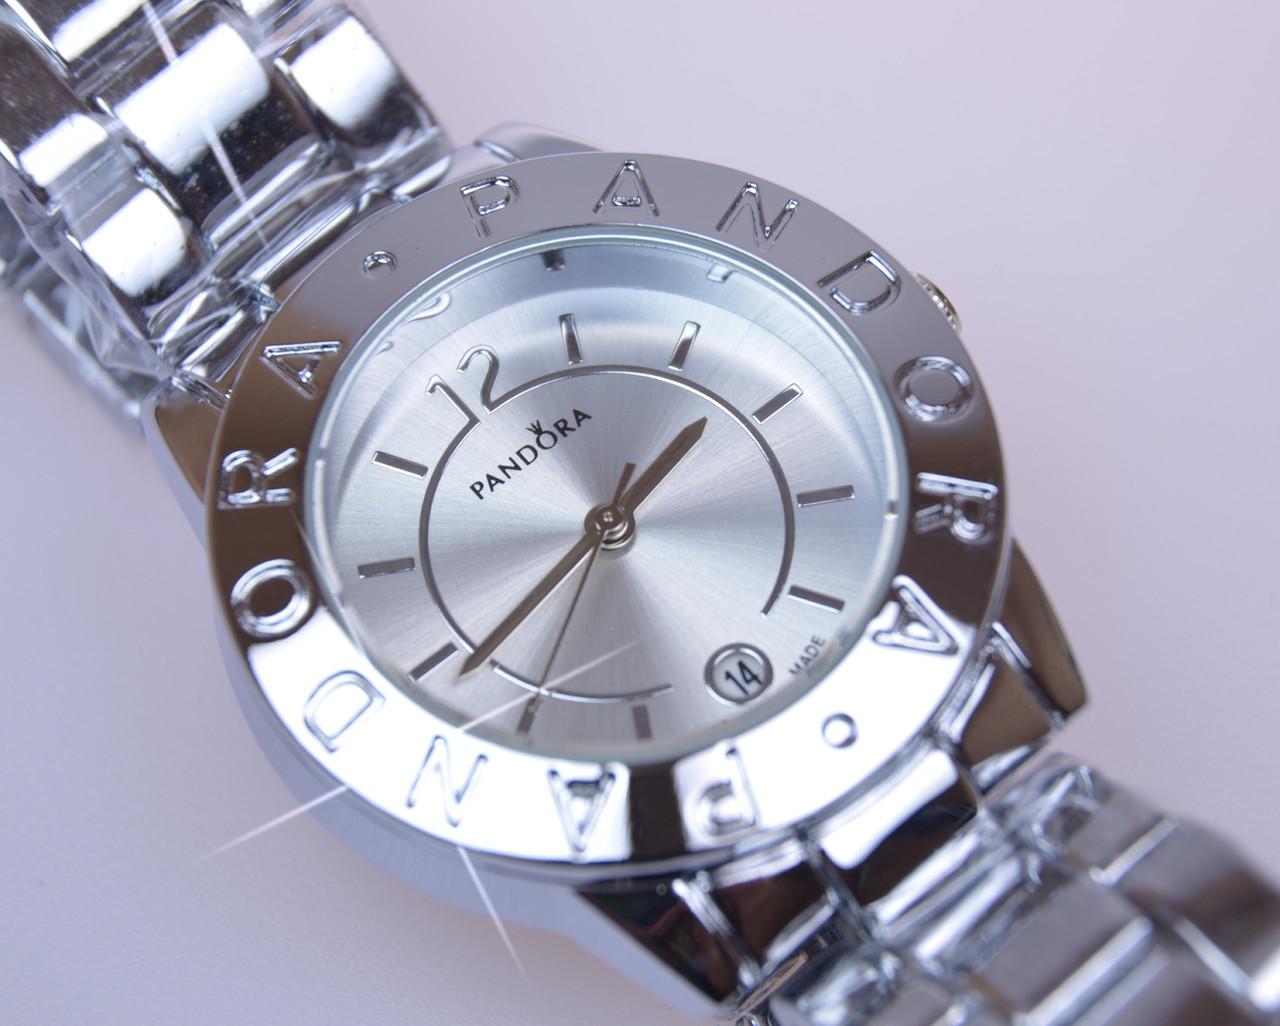 cbcdfed56cff Женские часы PANDORA (Пандора) Silver: продажа, цена в Николаеве ...